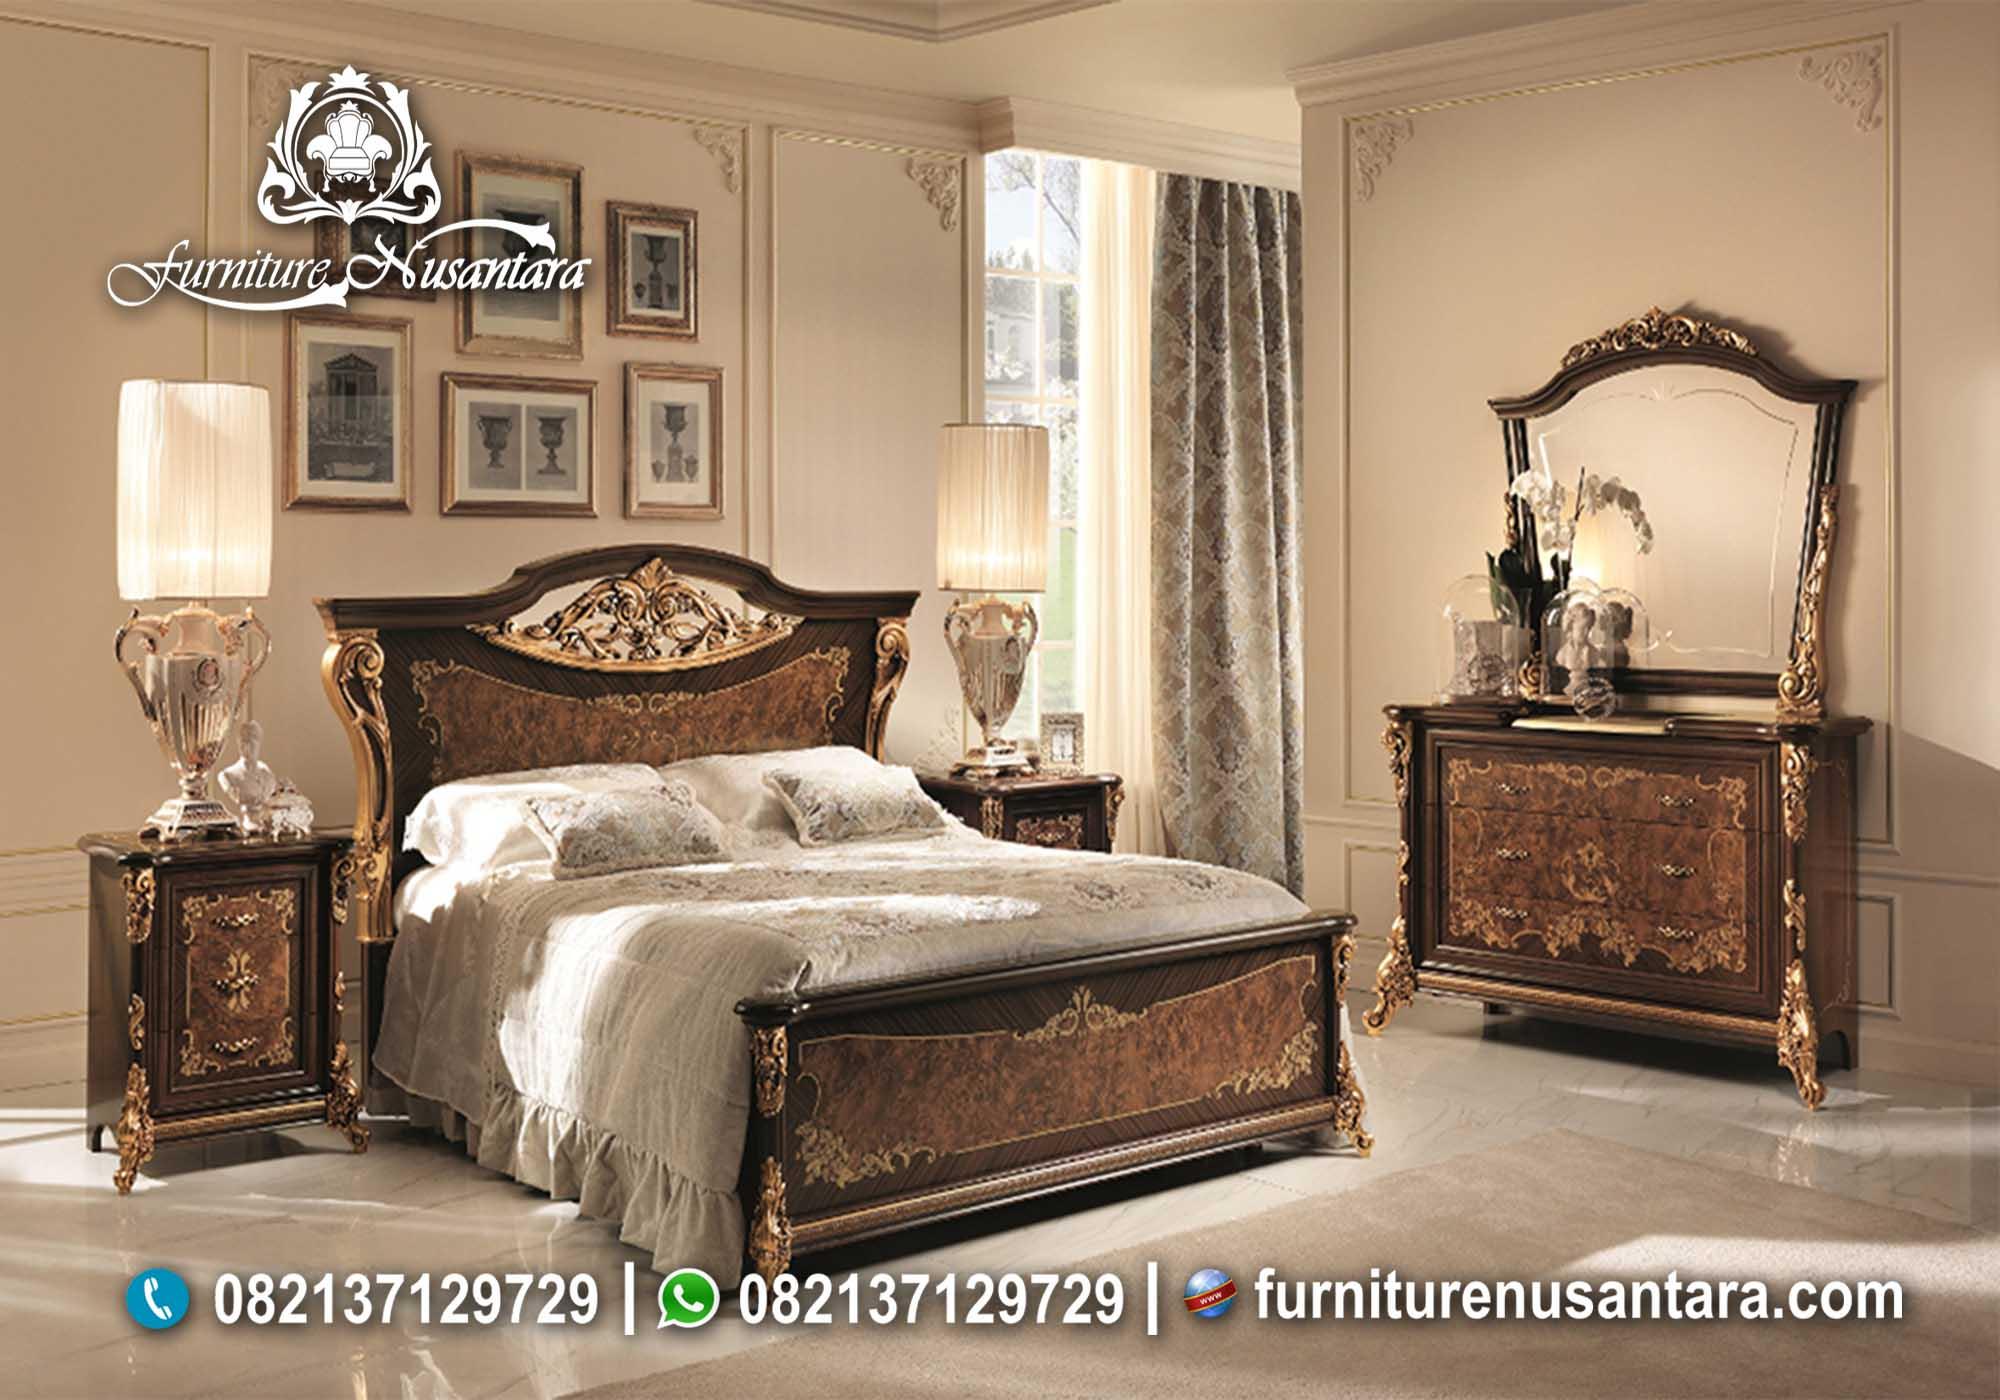 Tempat Tidur Kayu Natural KS-85, Furniture Nusantara